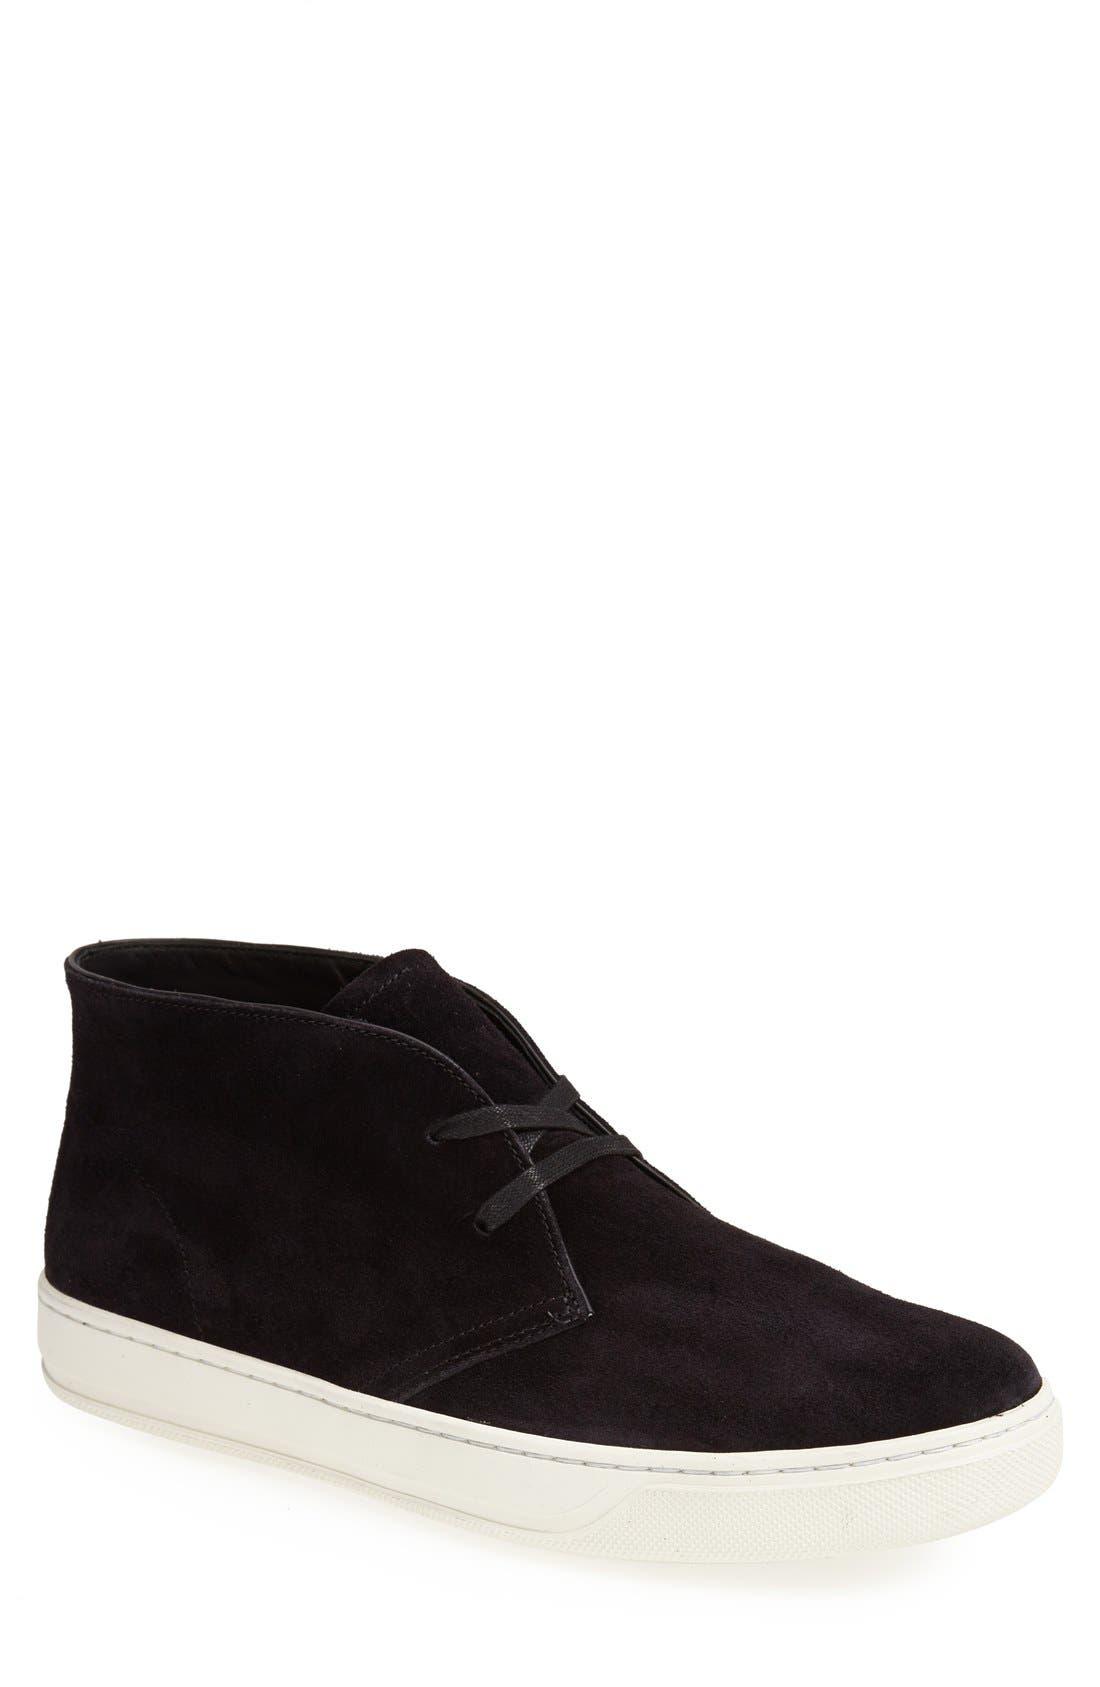 'Abe' Chukka Sneaker,                             Main thumbnail 1, color,                             002